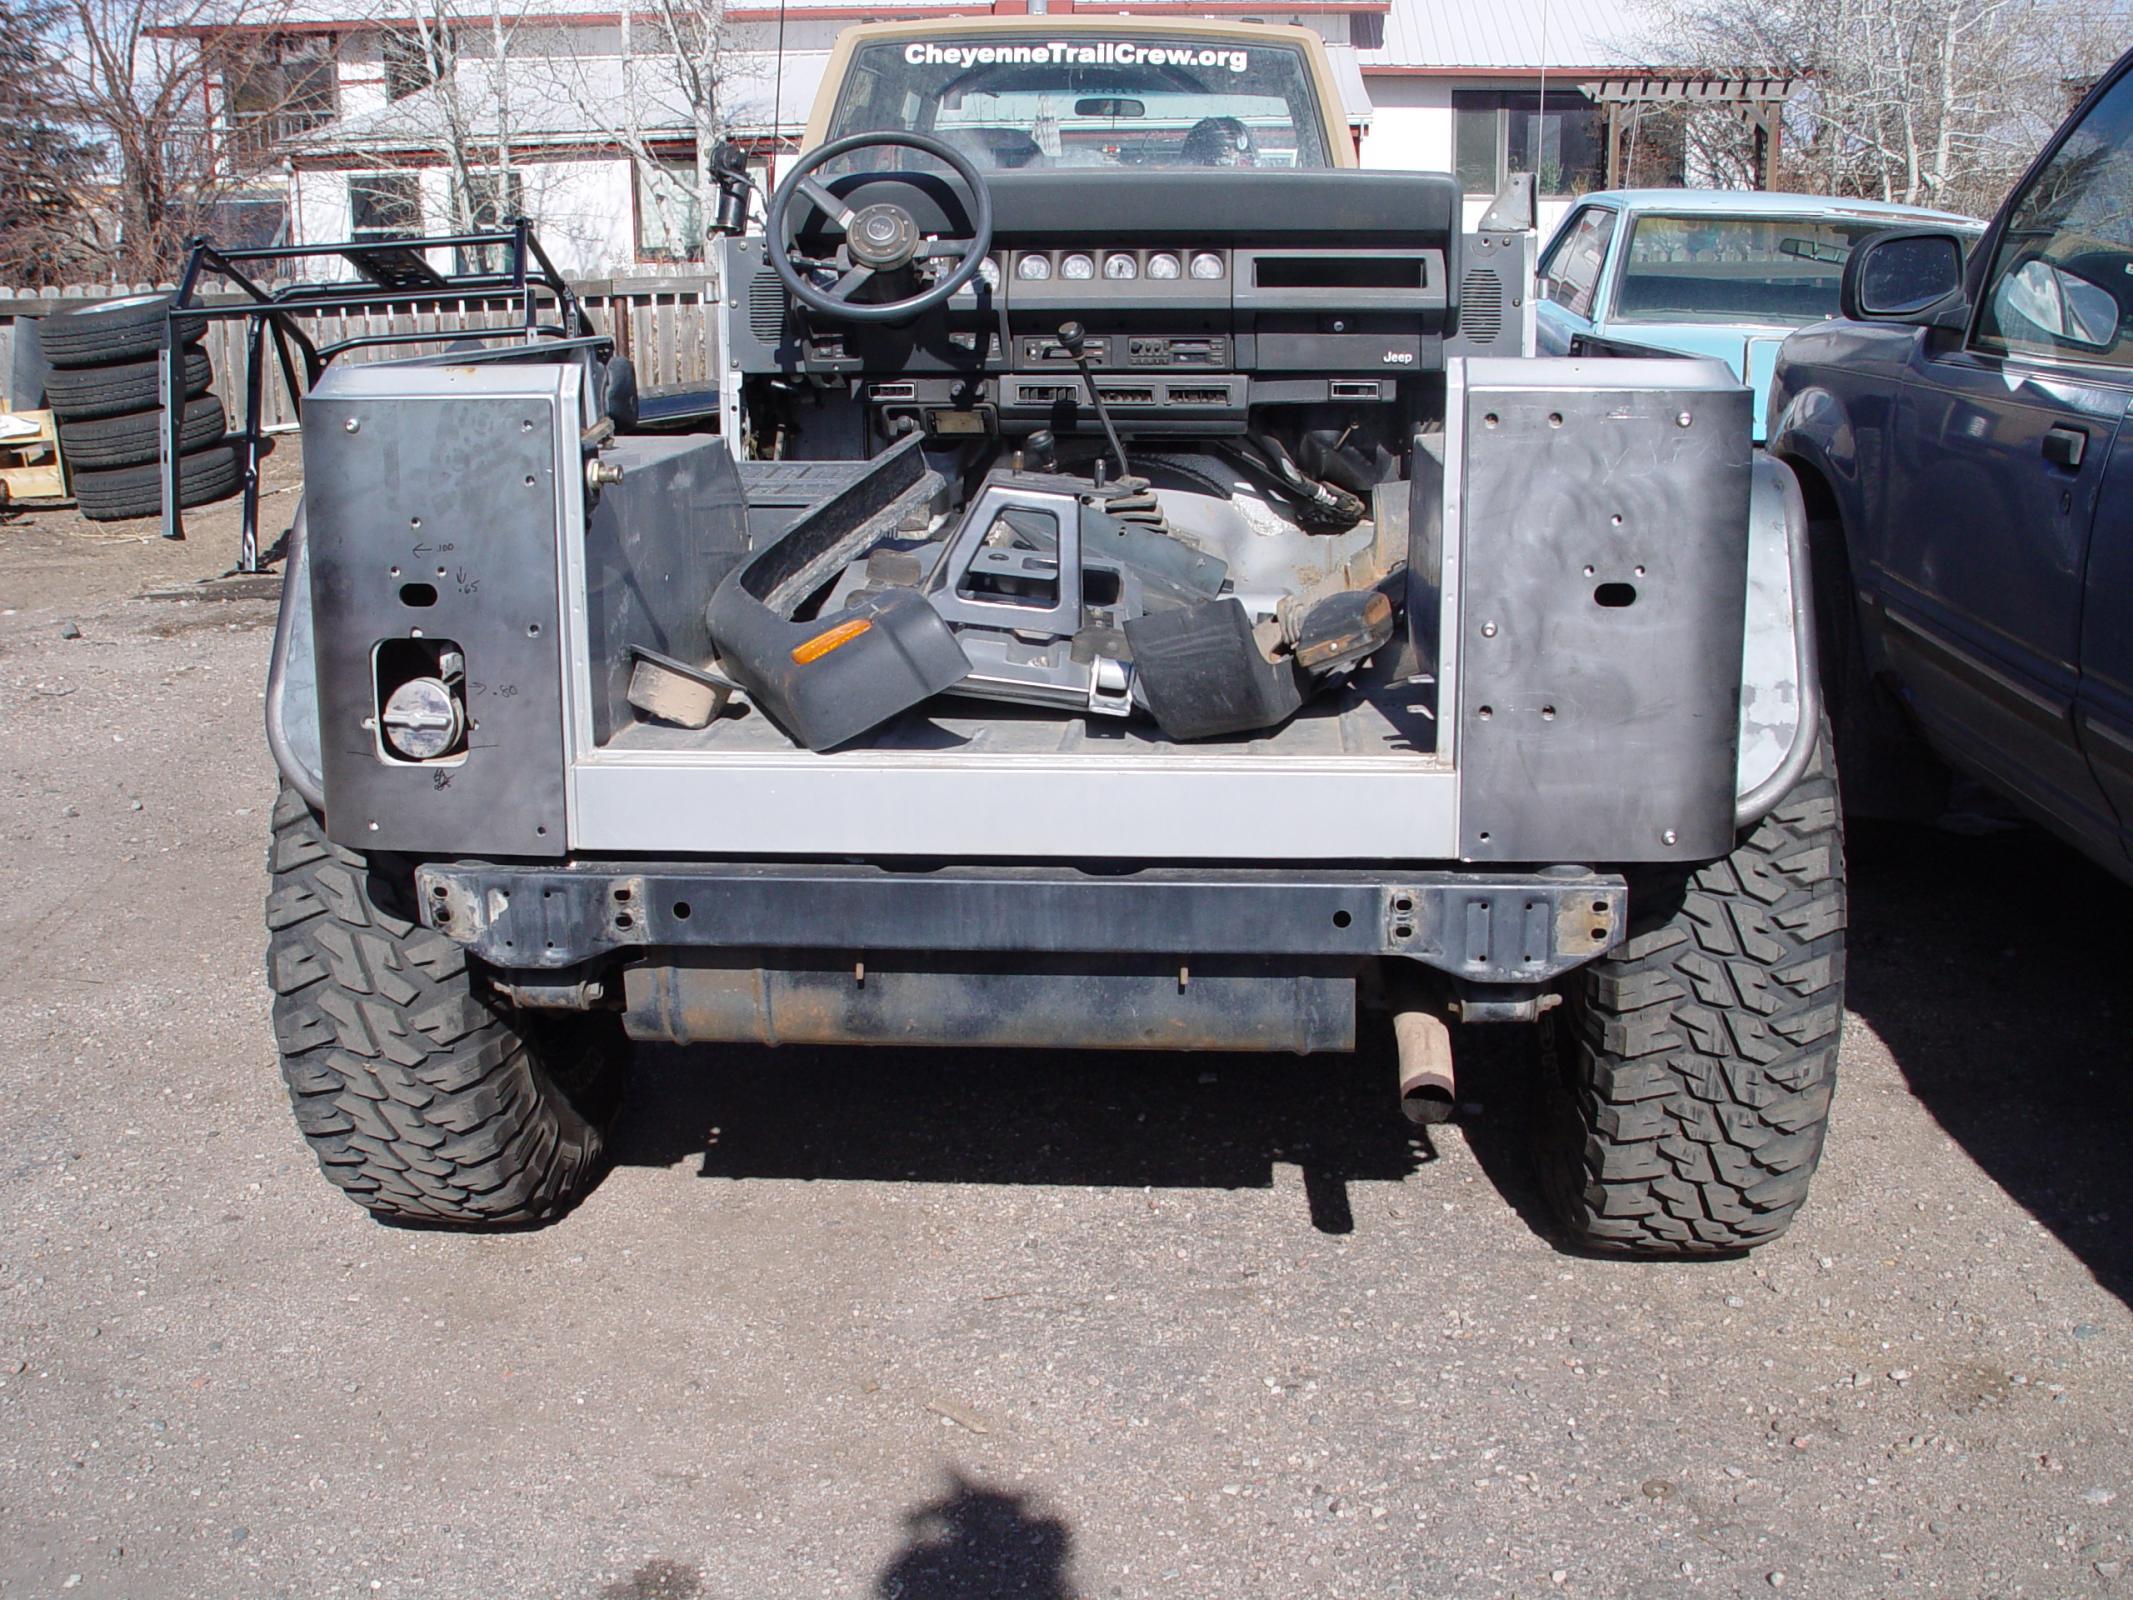 TNT Customs Y3CLED - YJ Corner Armor 3 Inch Flare Full Length 4 Inch LED Cutouts 87-95 Wrangler YJ